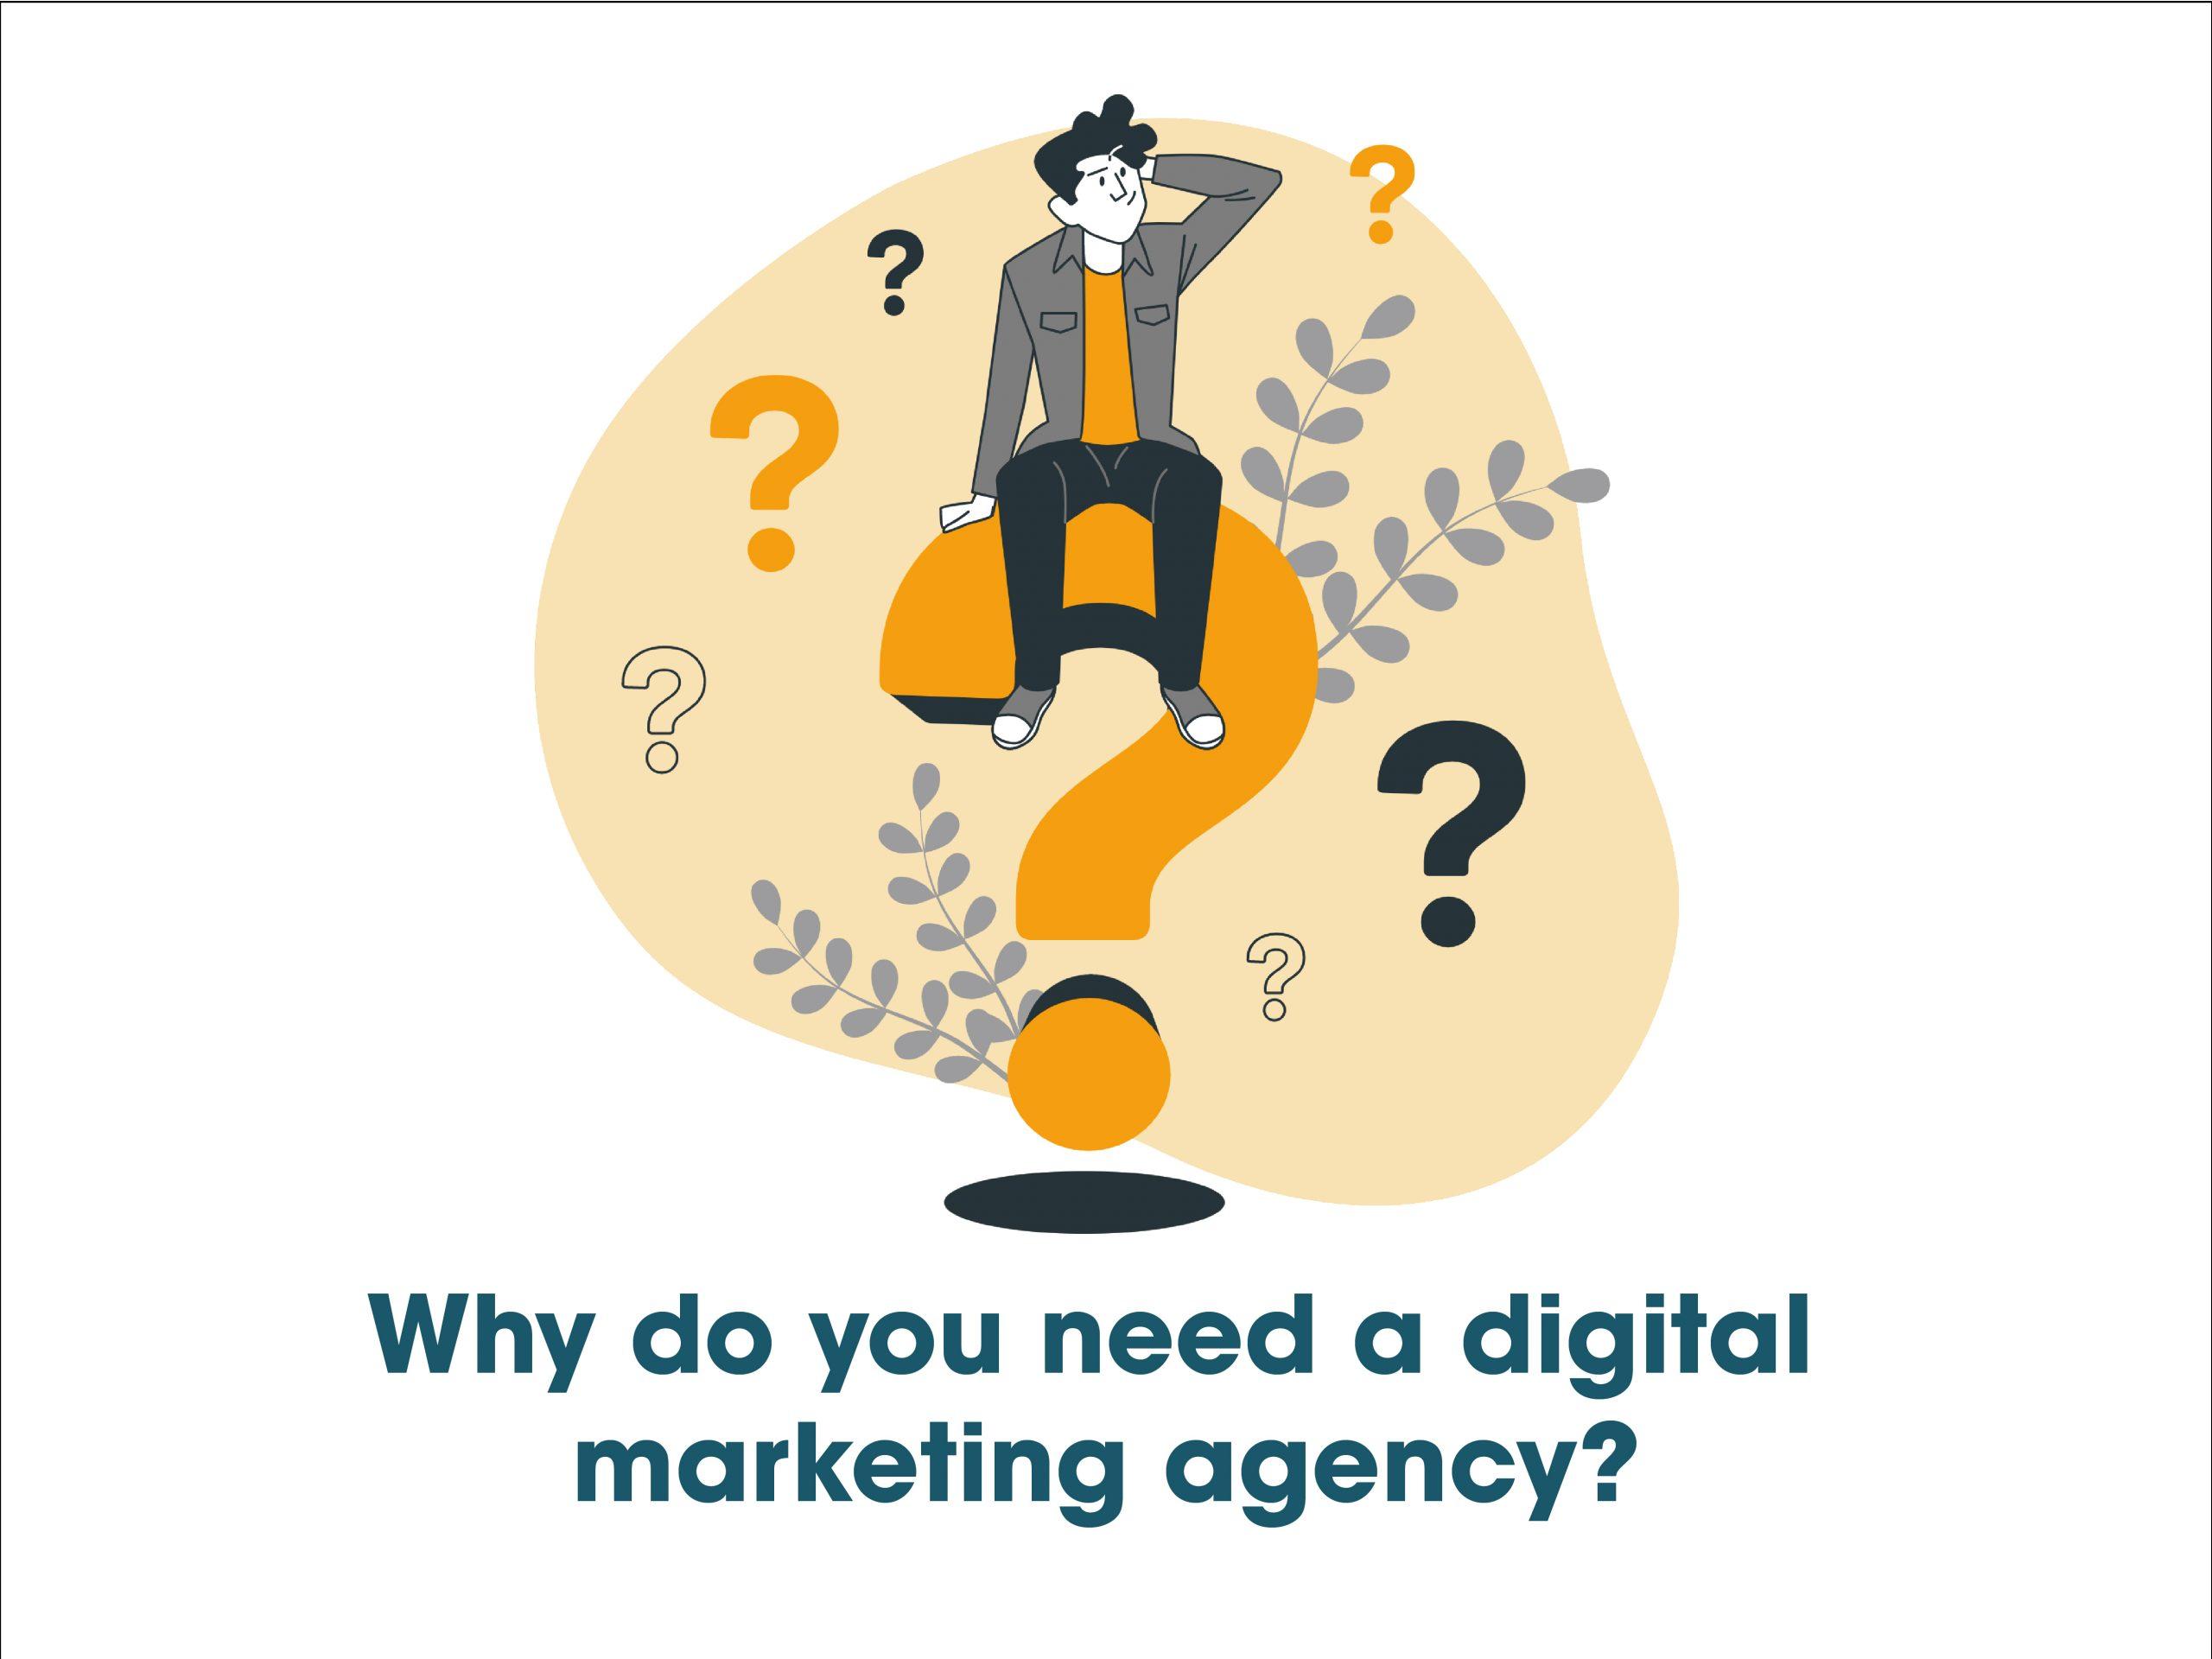 Why-do-you-need-a-digital-marketing-agency